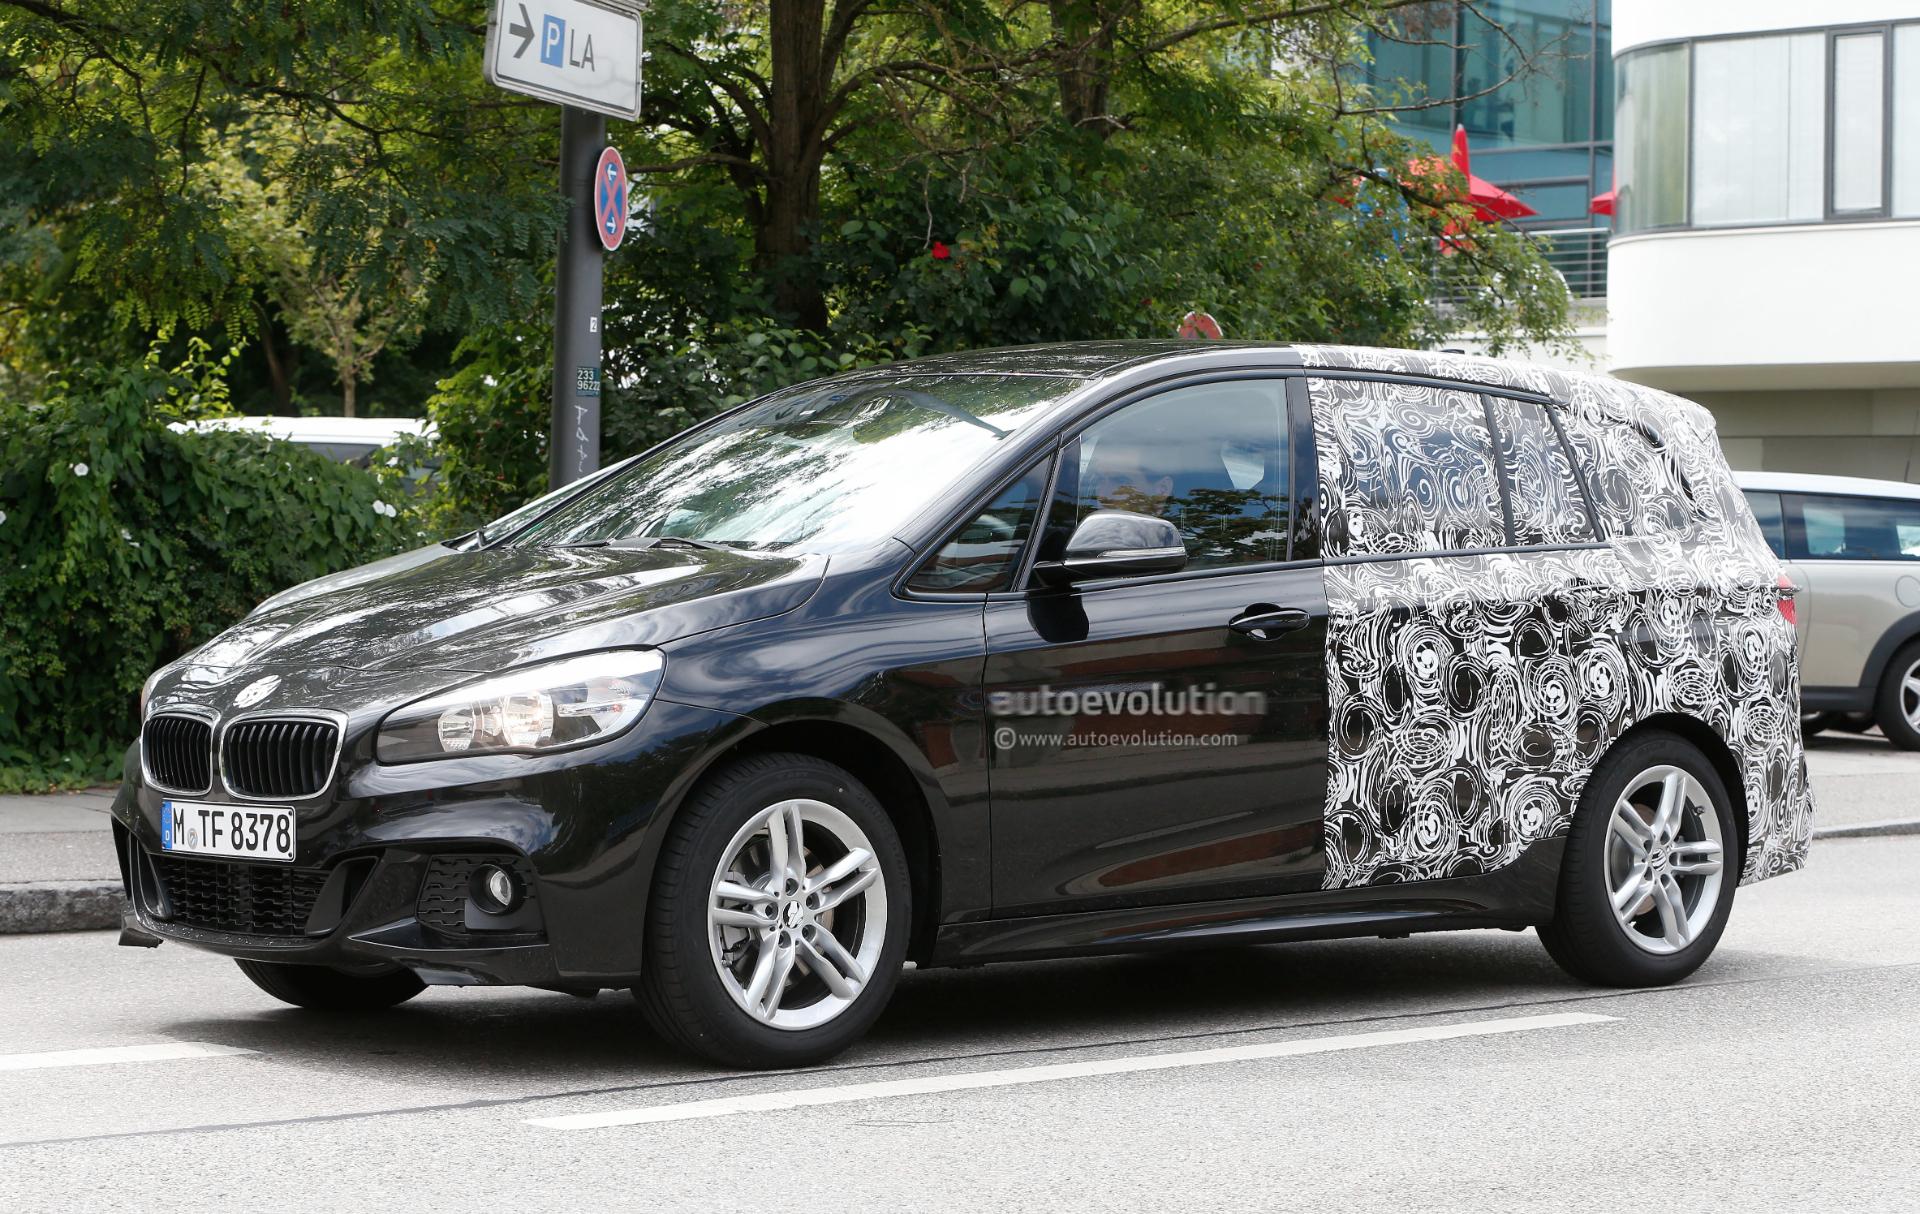 bmw 2 series active tourer 7 seater spotted wearing m. Black Bedroom Furniture Sets. Home Design Ideas